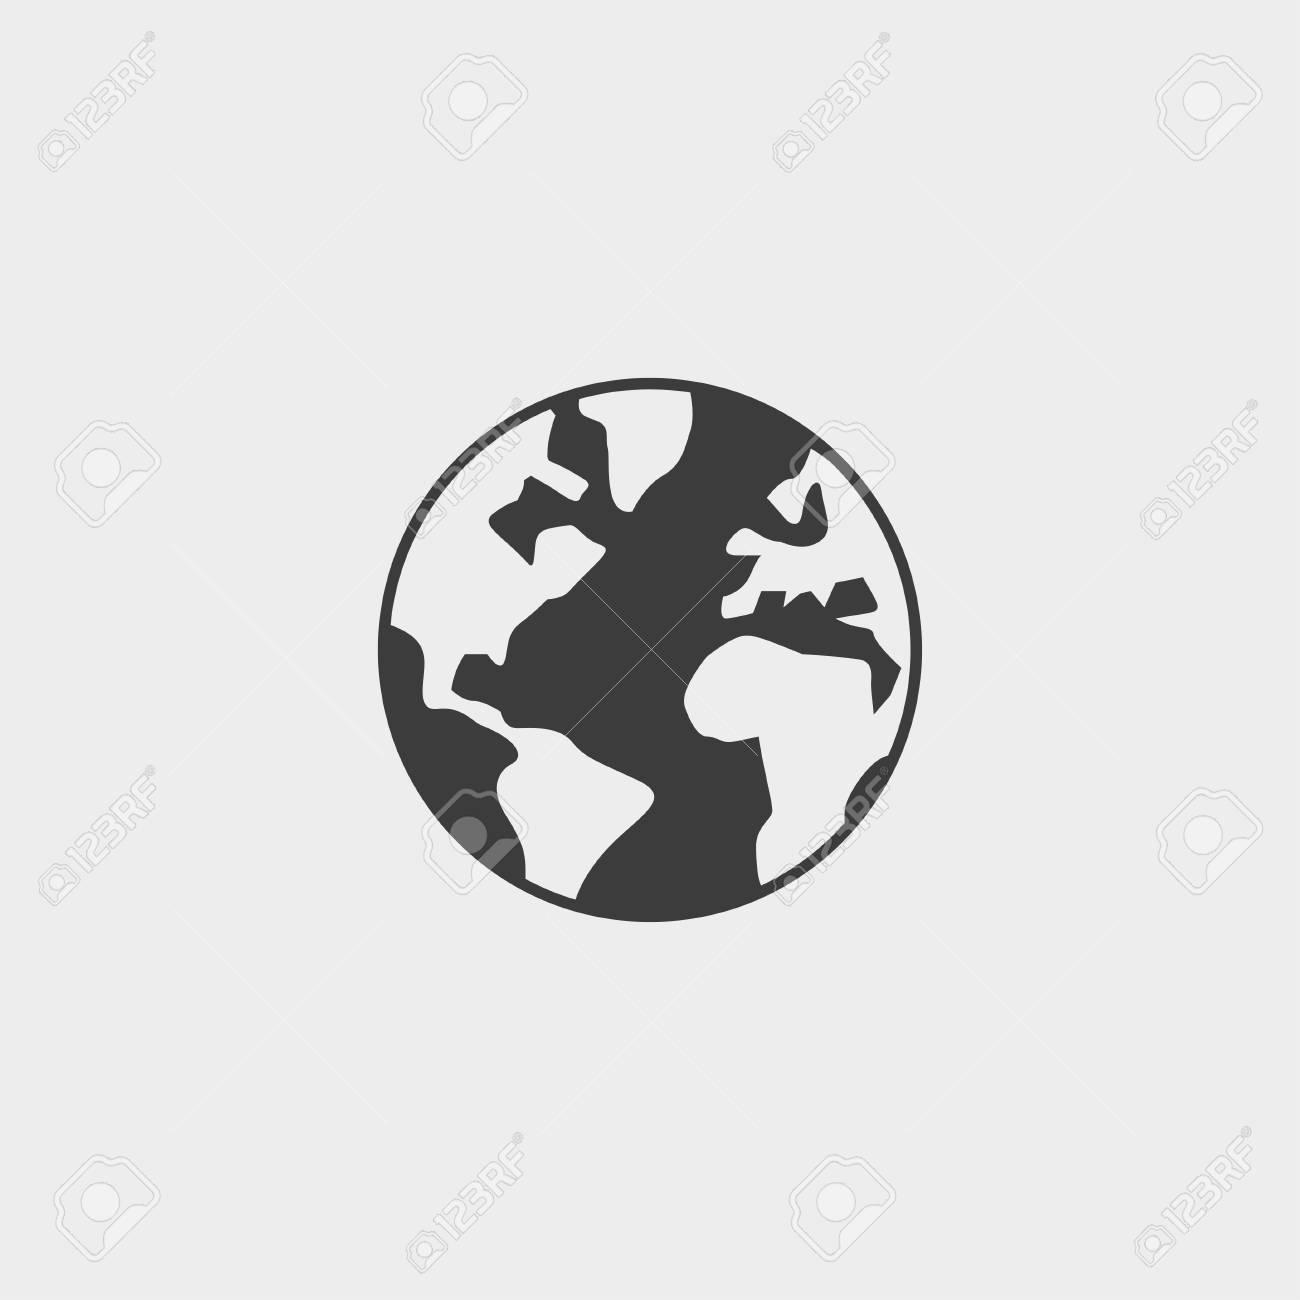 World icon in a flat design in black color. - 59438267